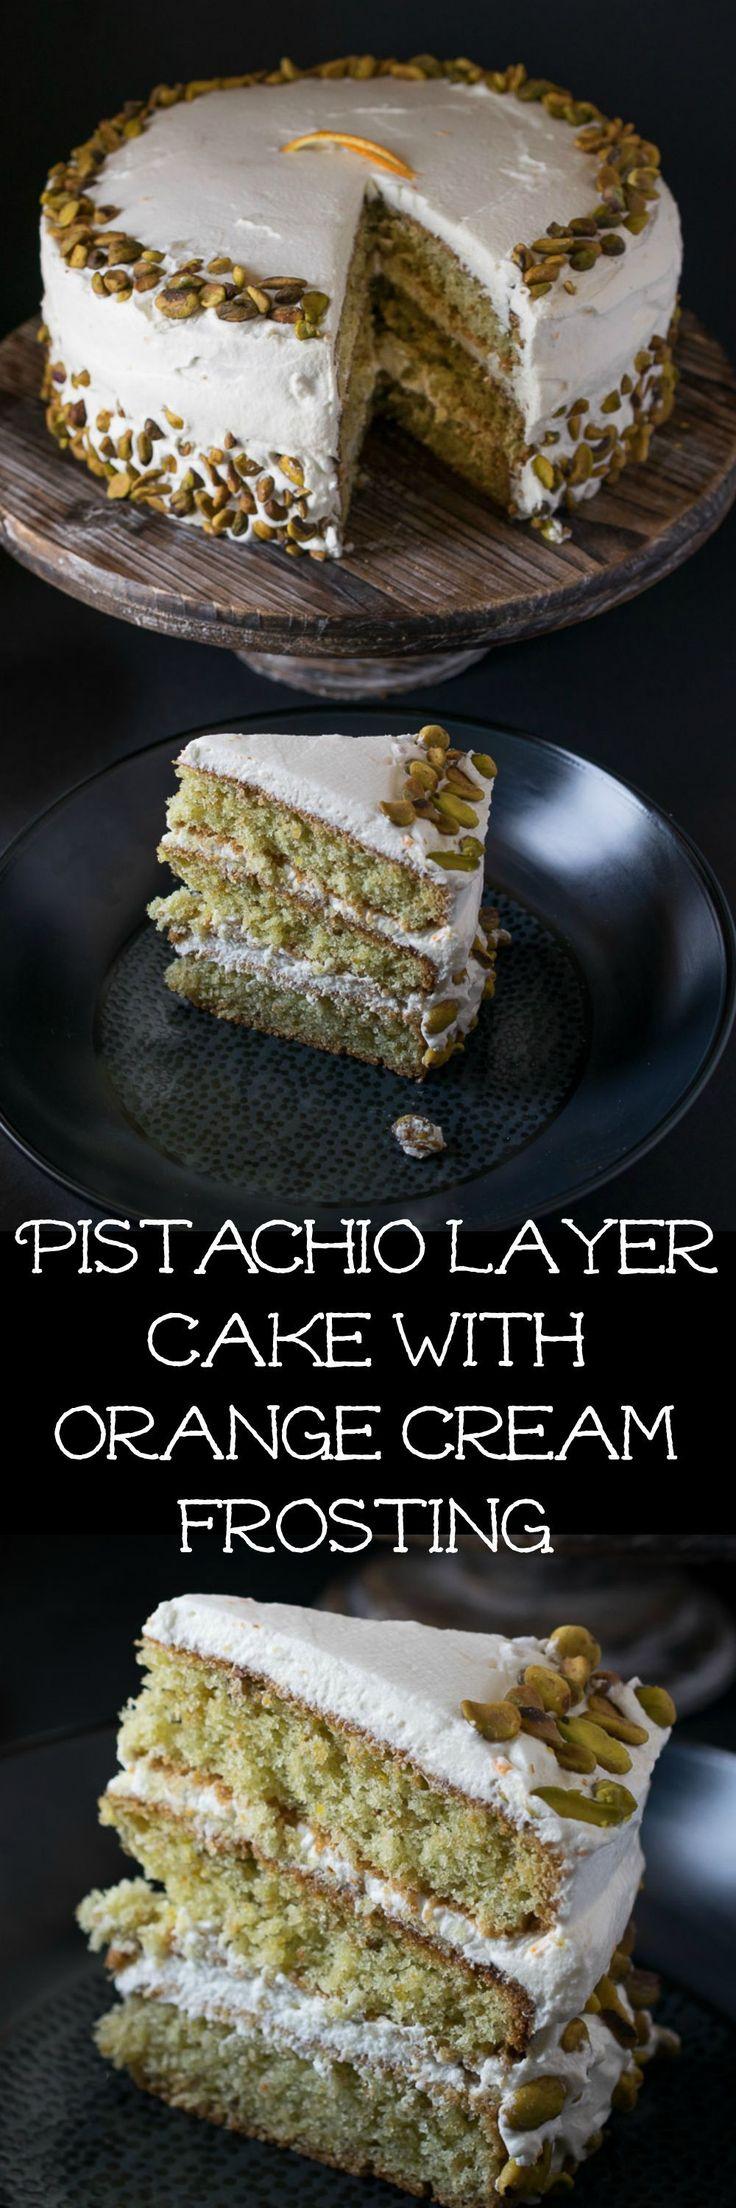 Pistachio Layer Cake with Orange Cream  Frosting #layercake #pistachio #cake